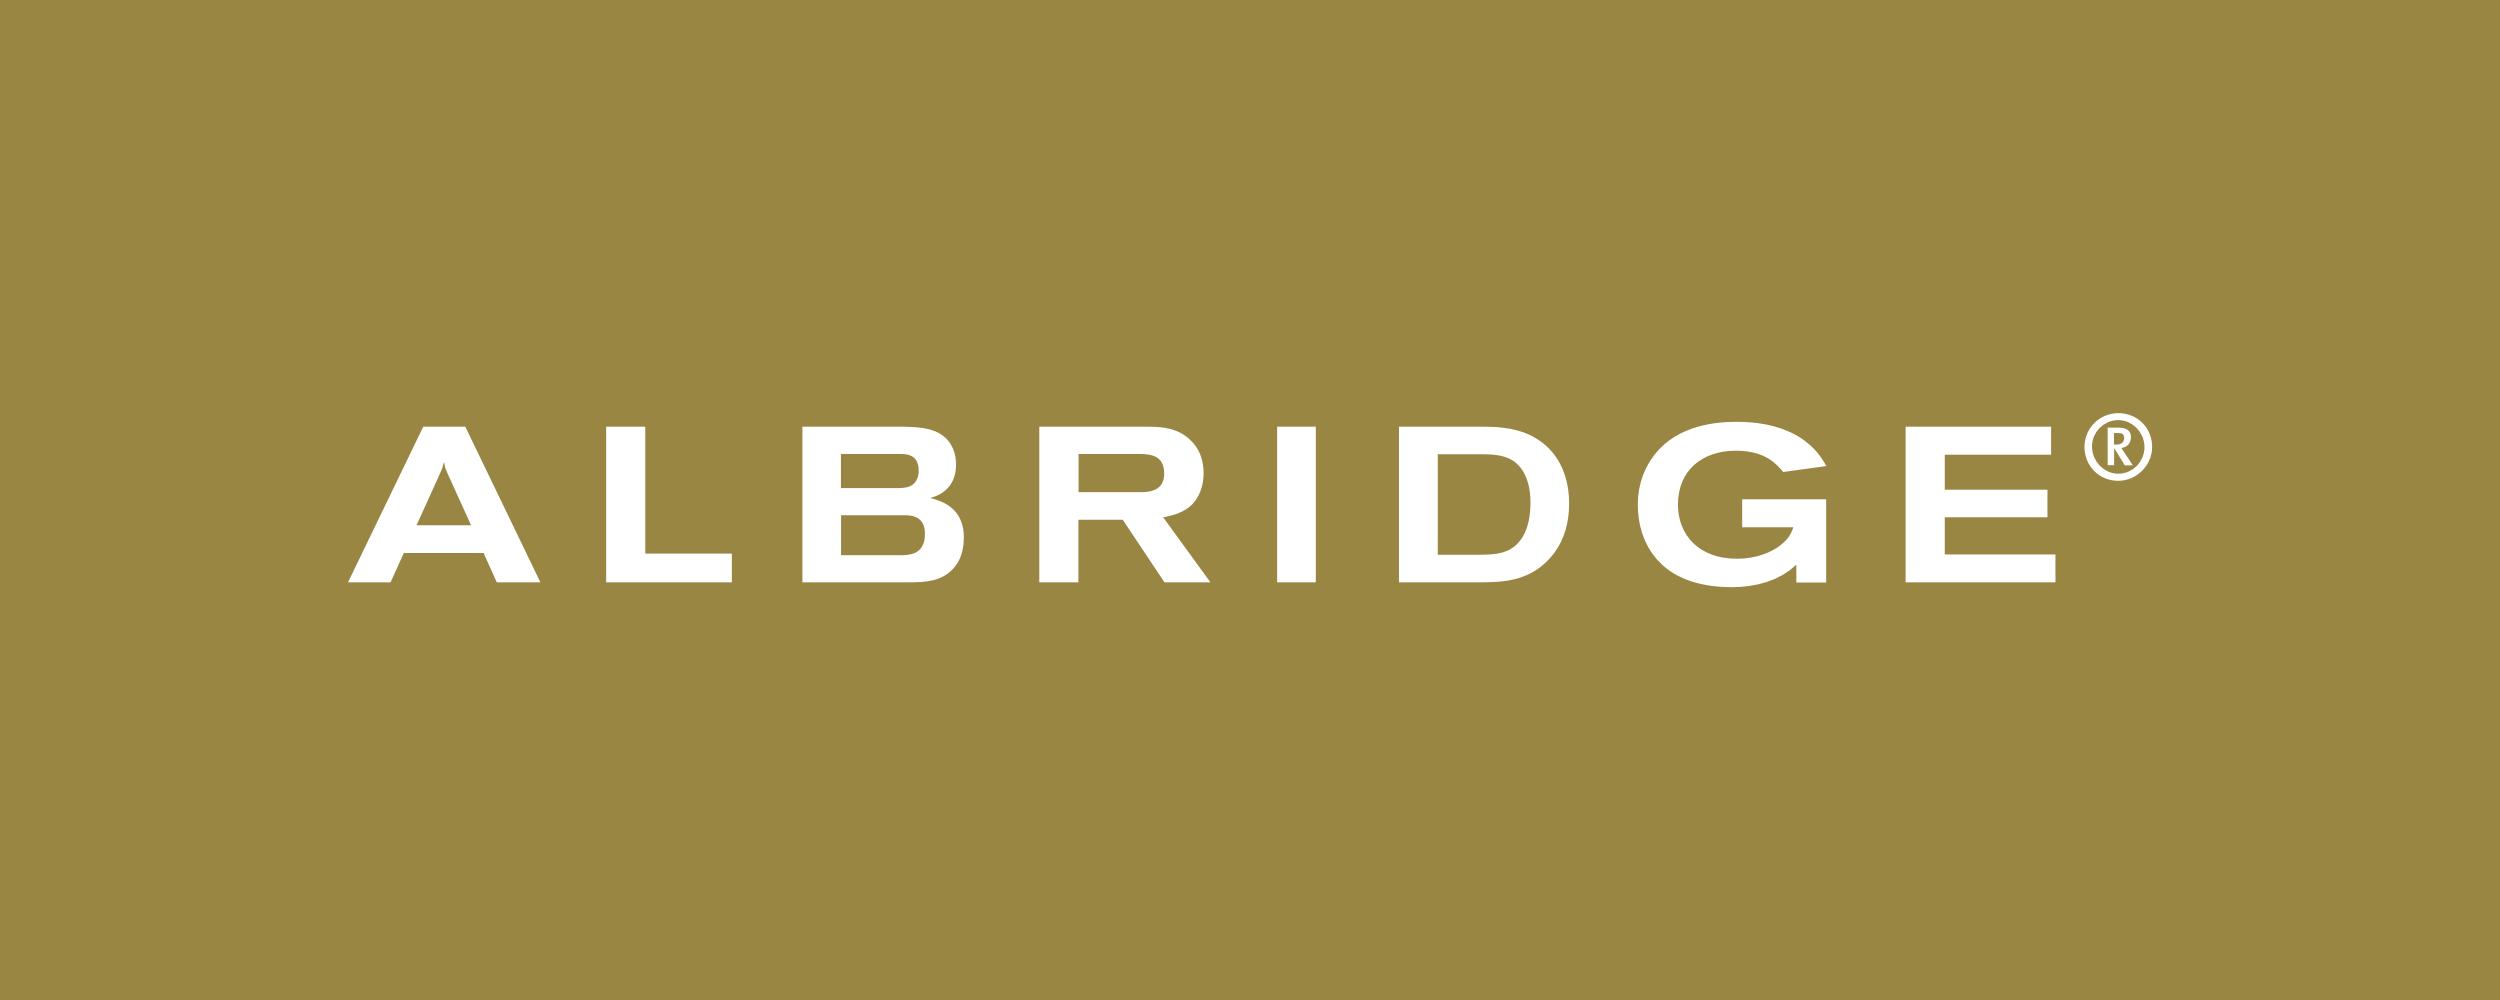 Albridge Dayton, OH Gudorf Financial Group, LLC